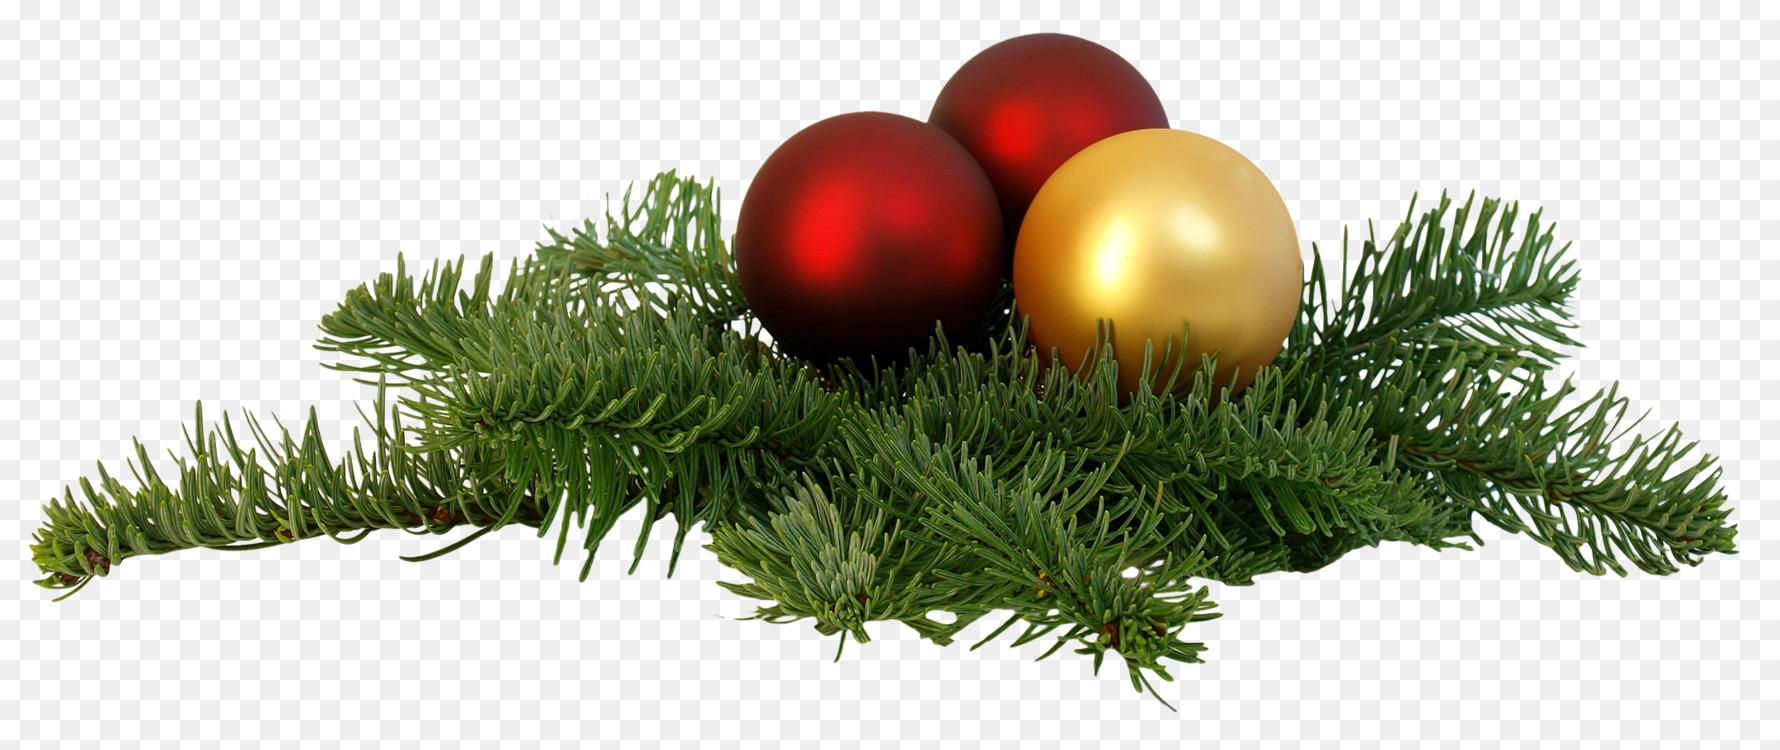 Fir,Pine Family,Christmas Ornament Transparent PNG.